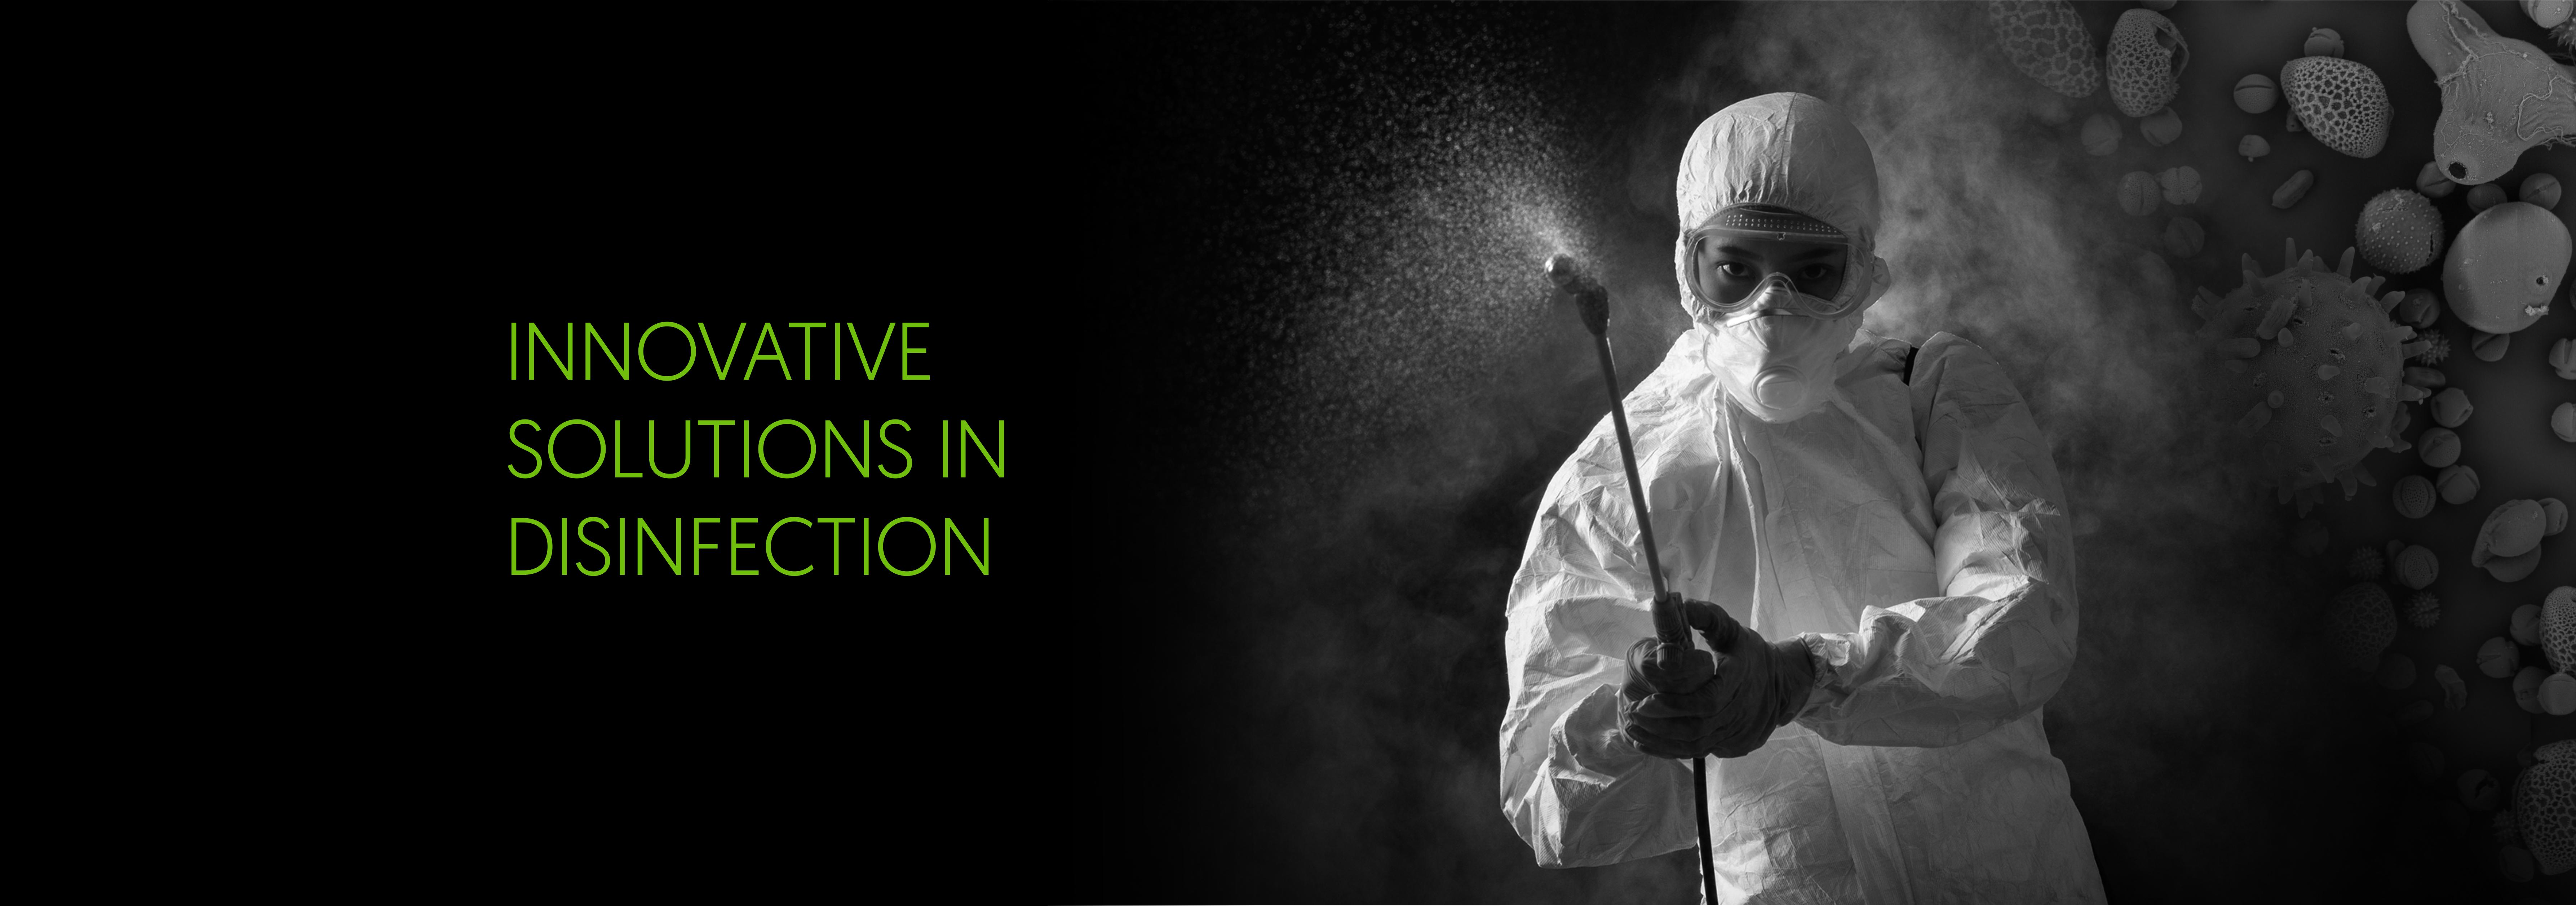 COVIX DISINFECTING MACHINES. OZONE GENERATOR FOGGING MACHINE